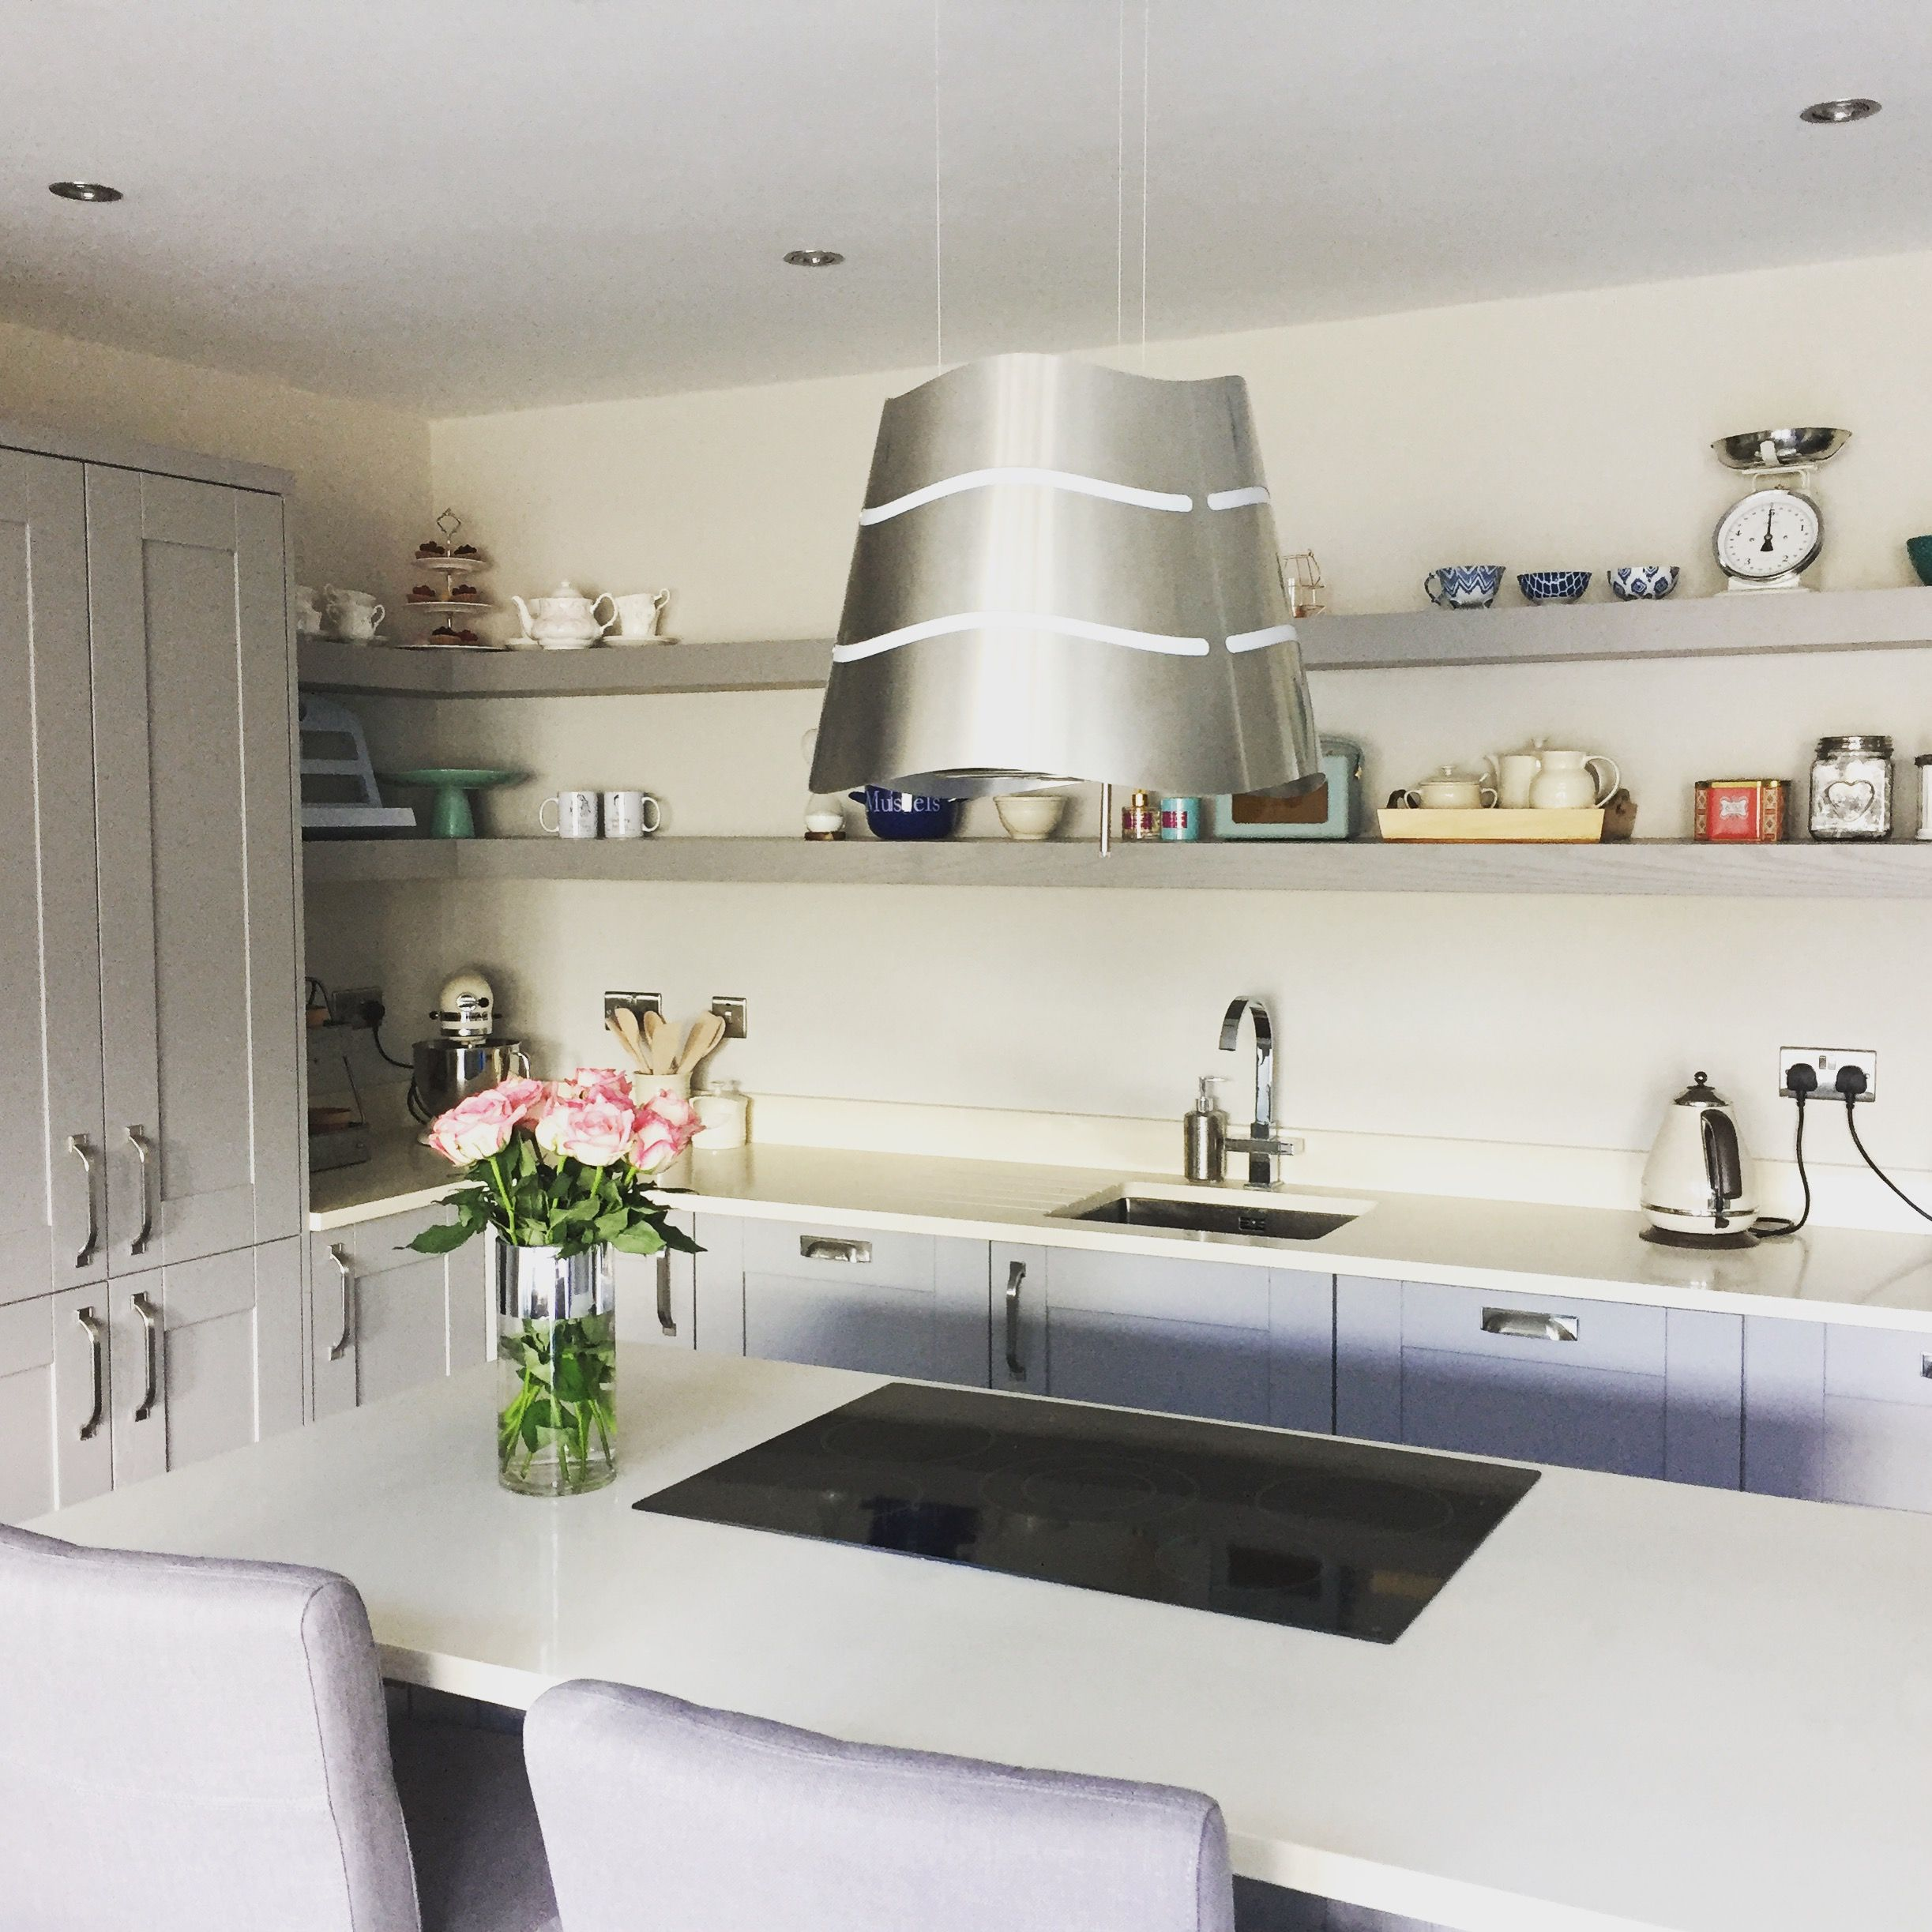 Best My Kitchen Fresco Doors Sprayed In Farrow Ball Worsted 400 x 300